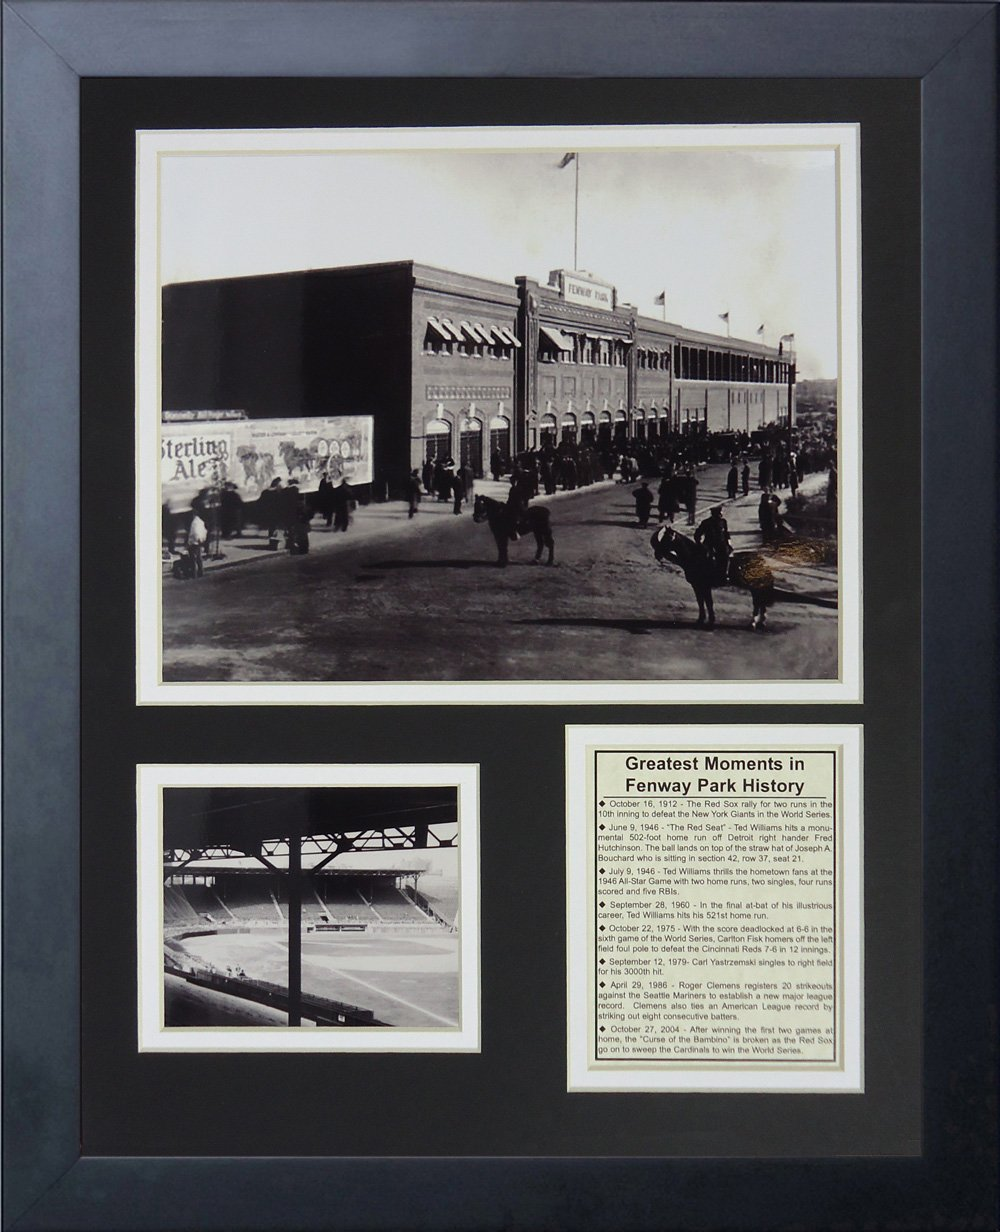 Legends Never Die ''1912 Fenway Park'' Framed Photo Collage, 11 x 14-Inch